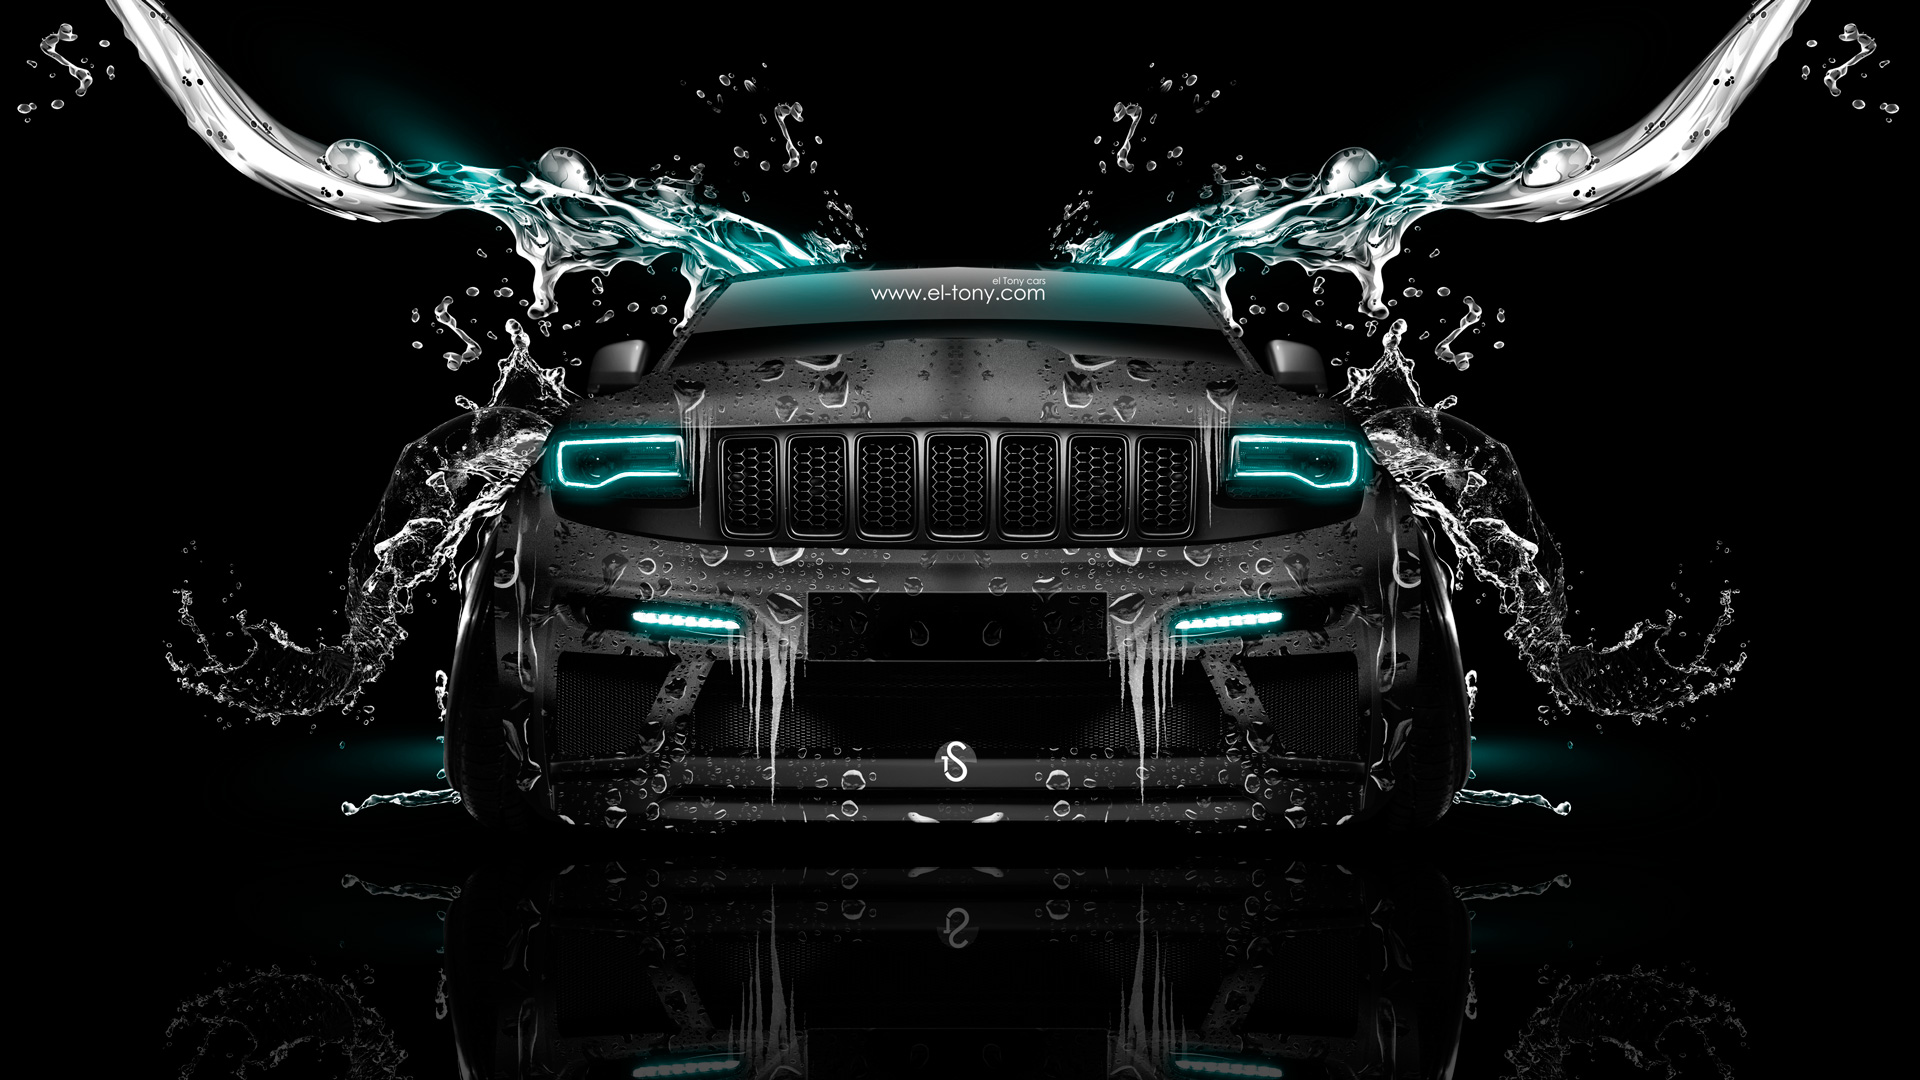 Hd wallpaper jeep - Jeep Grand Cherokee Srt8 Front Water Car 2014